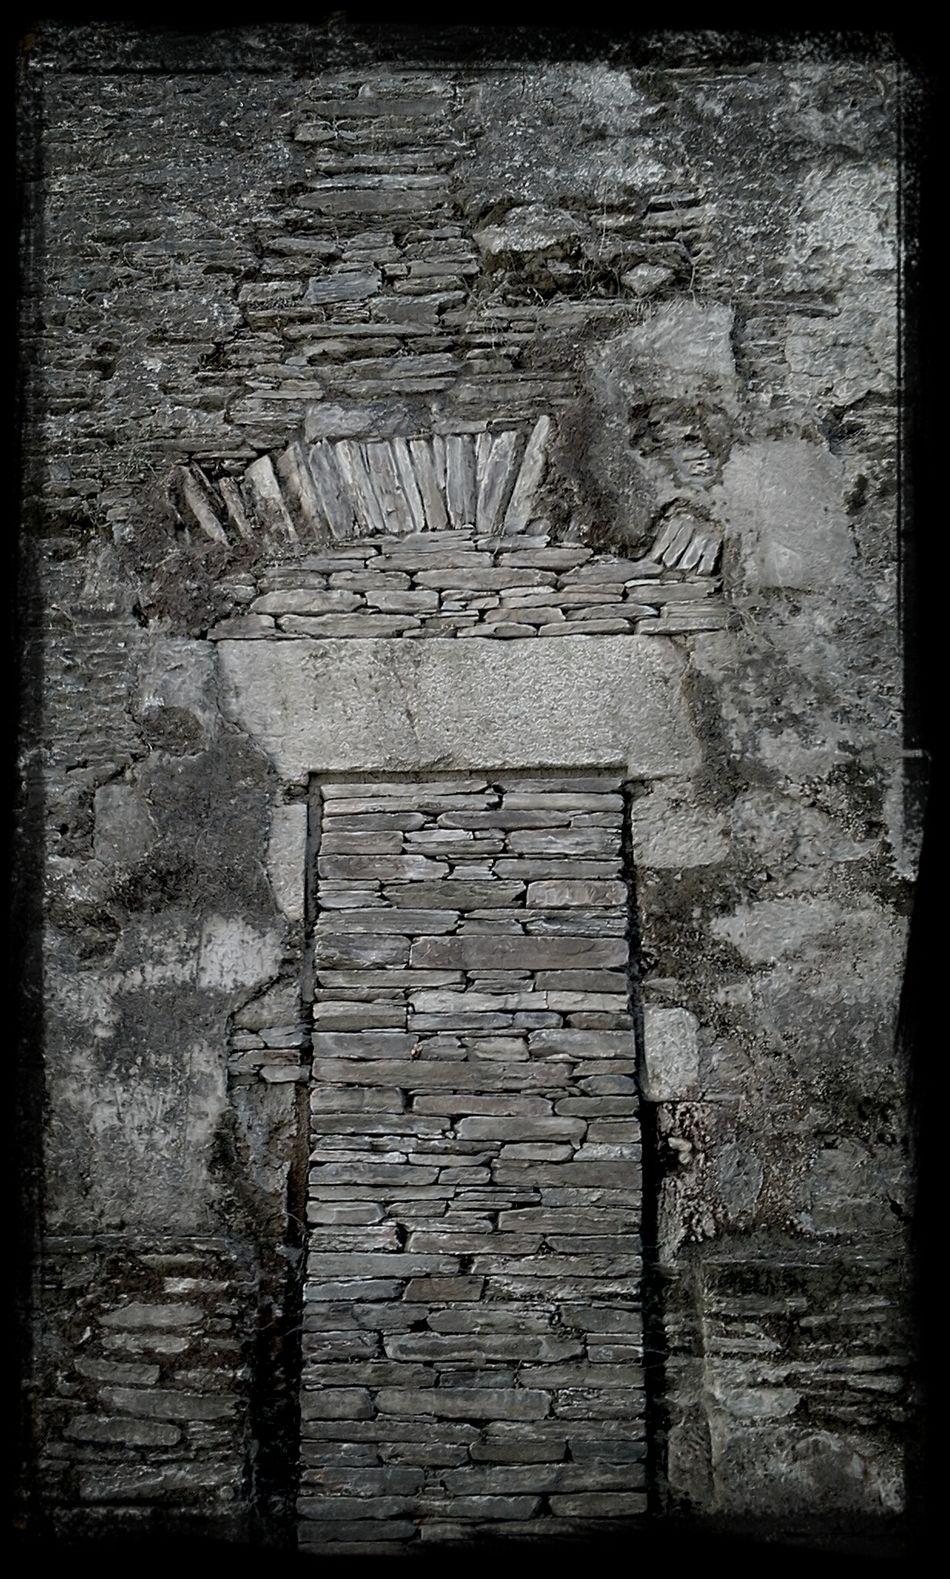 Closed and stoned door Shoot, Share, Learn - EyeEm Lugo Meetup Door Stone Wall